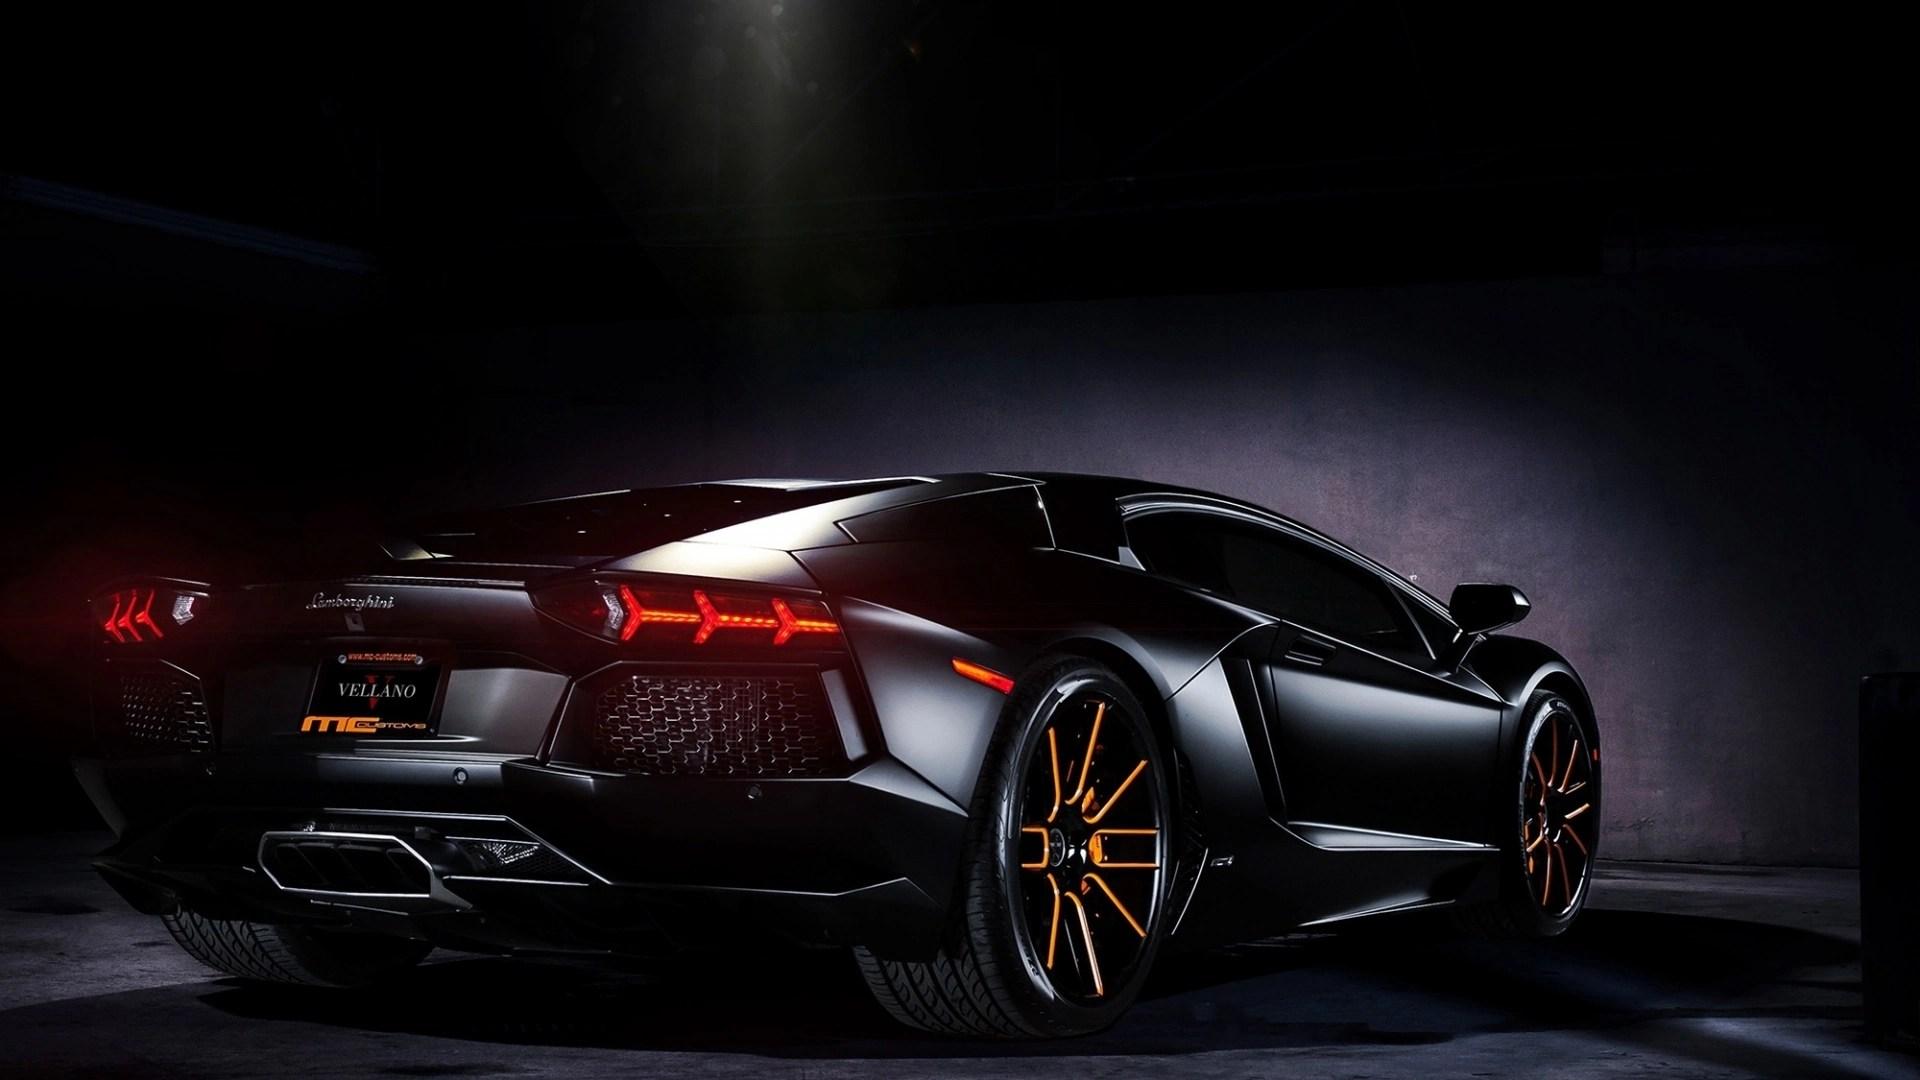 Amazing car with Black background